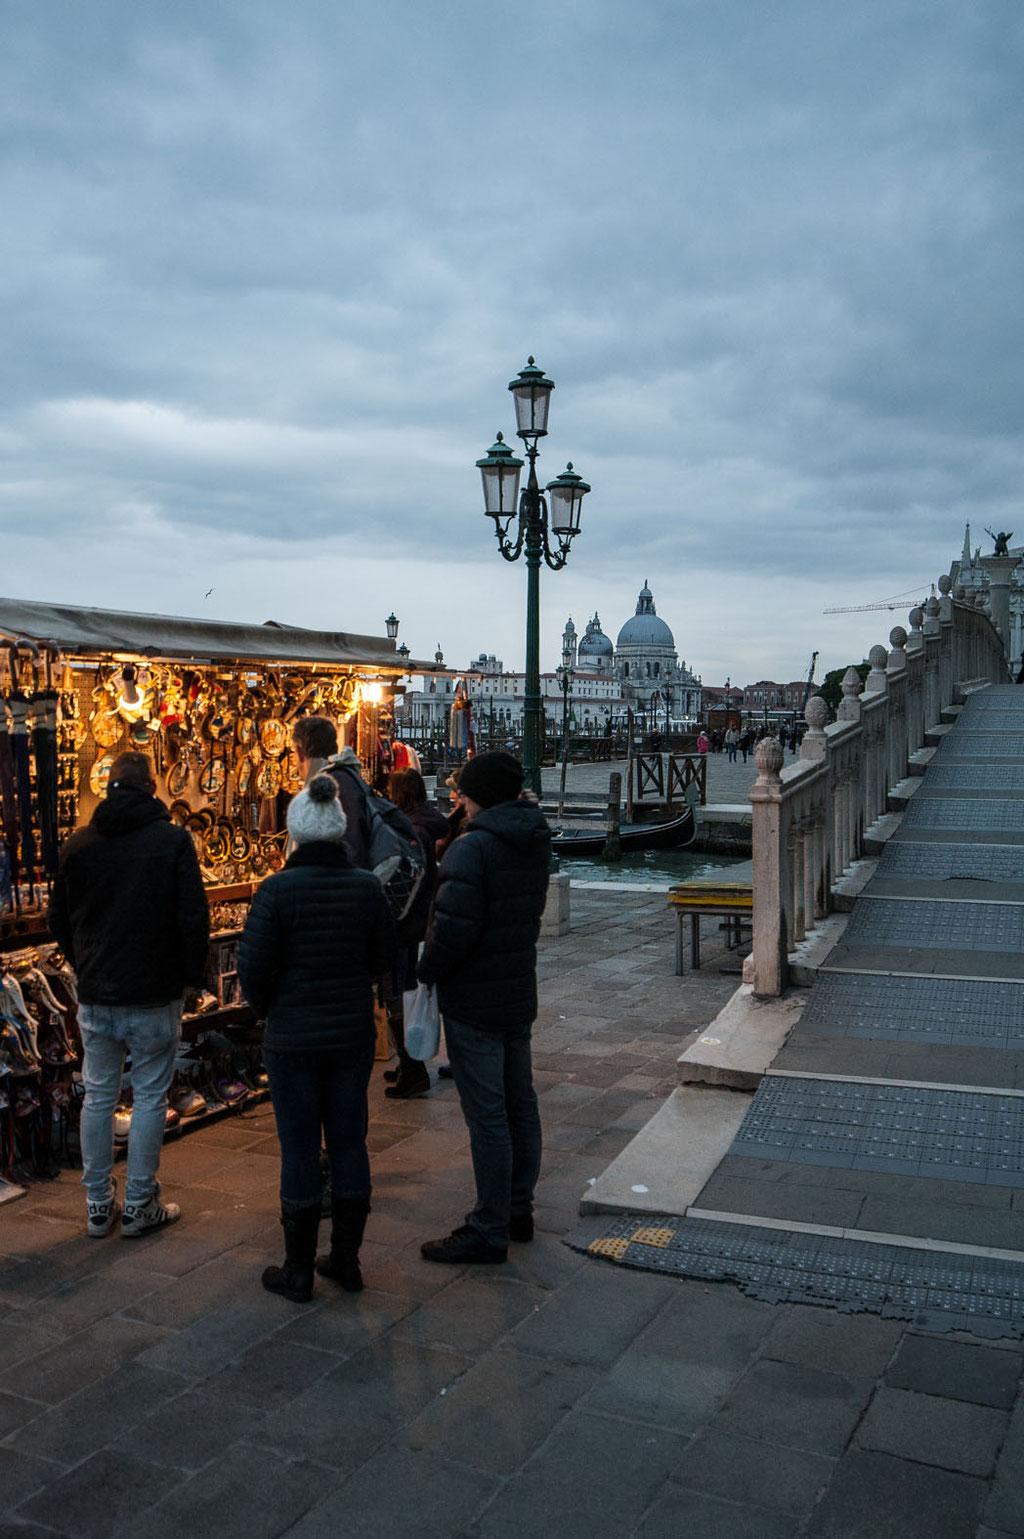 Venedig/Venice (IT)